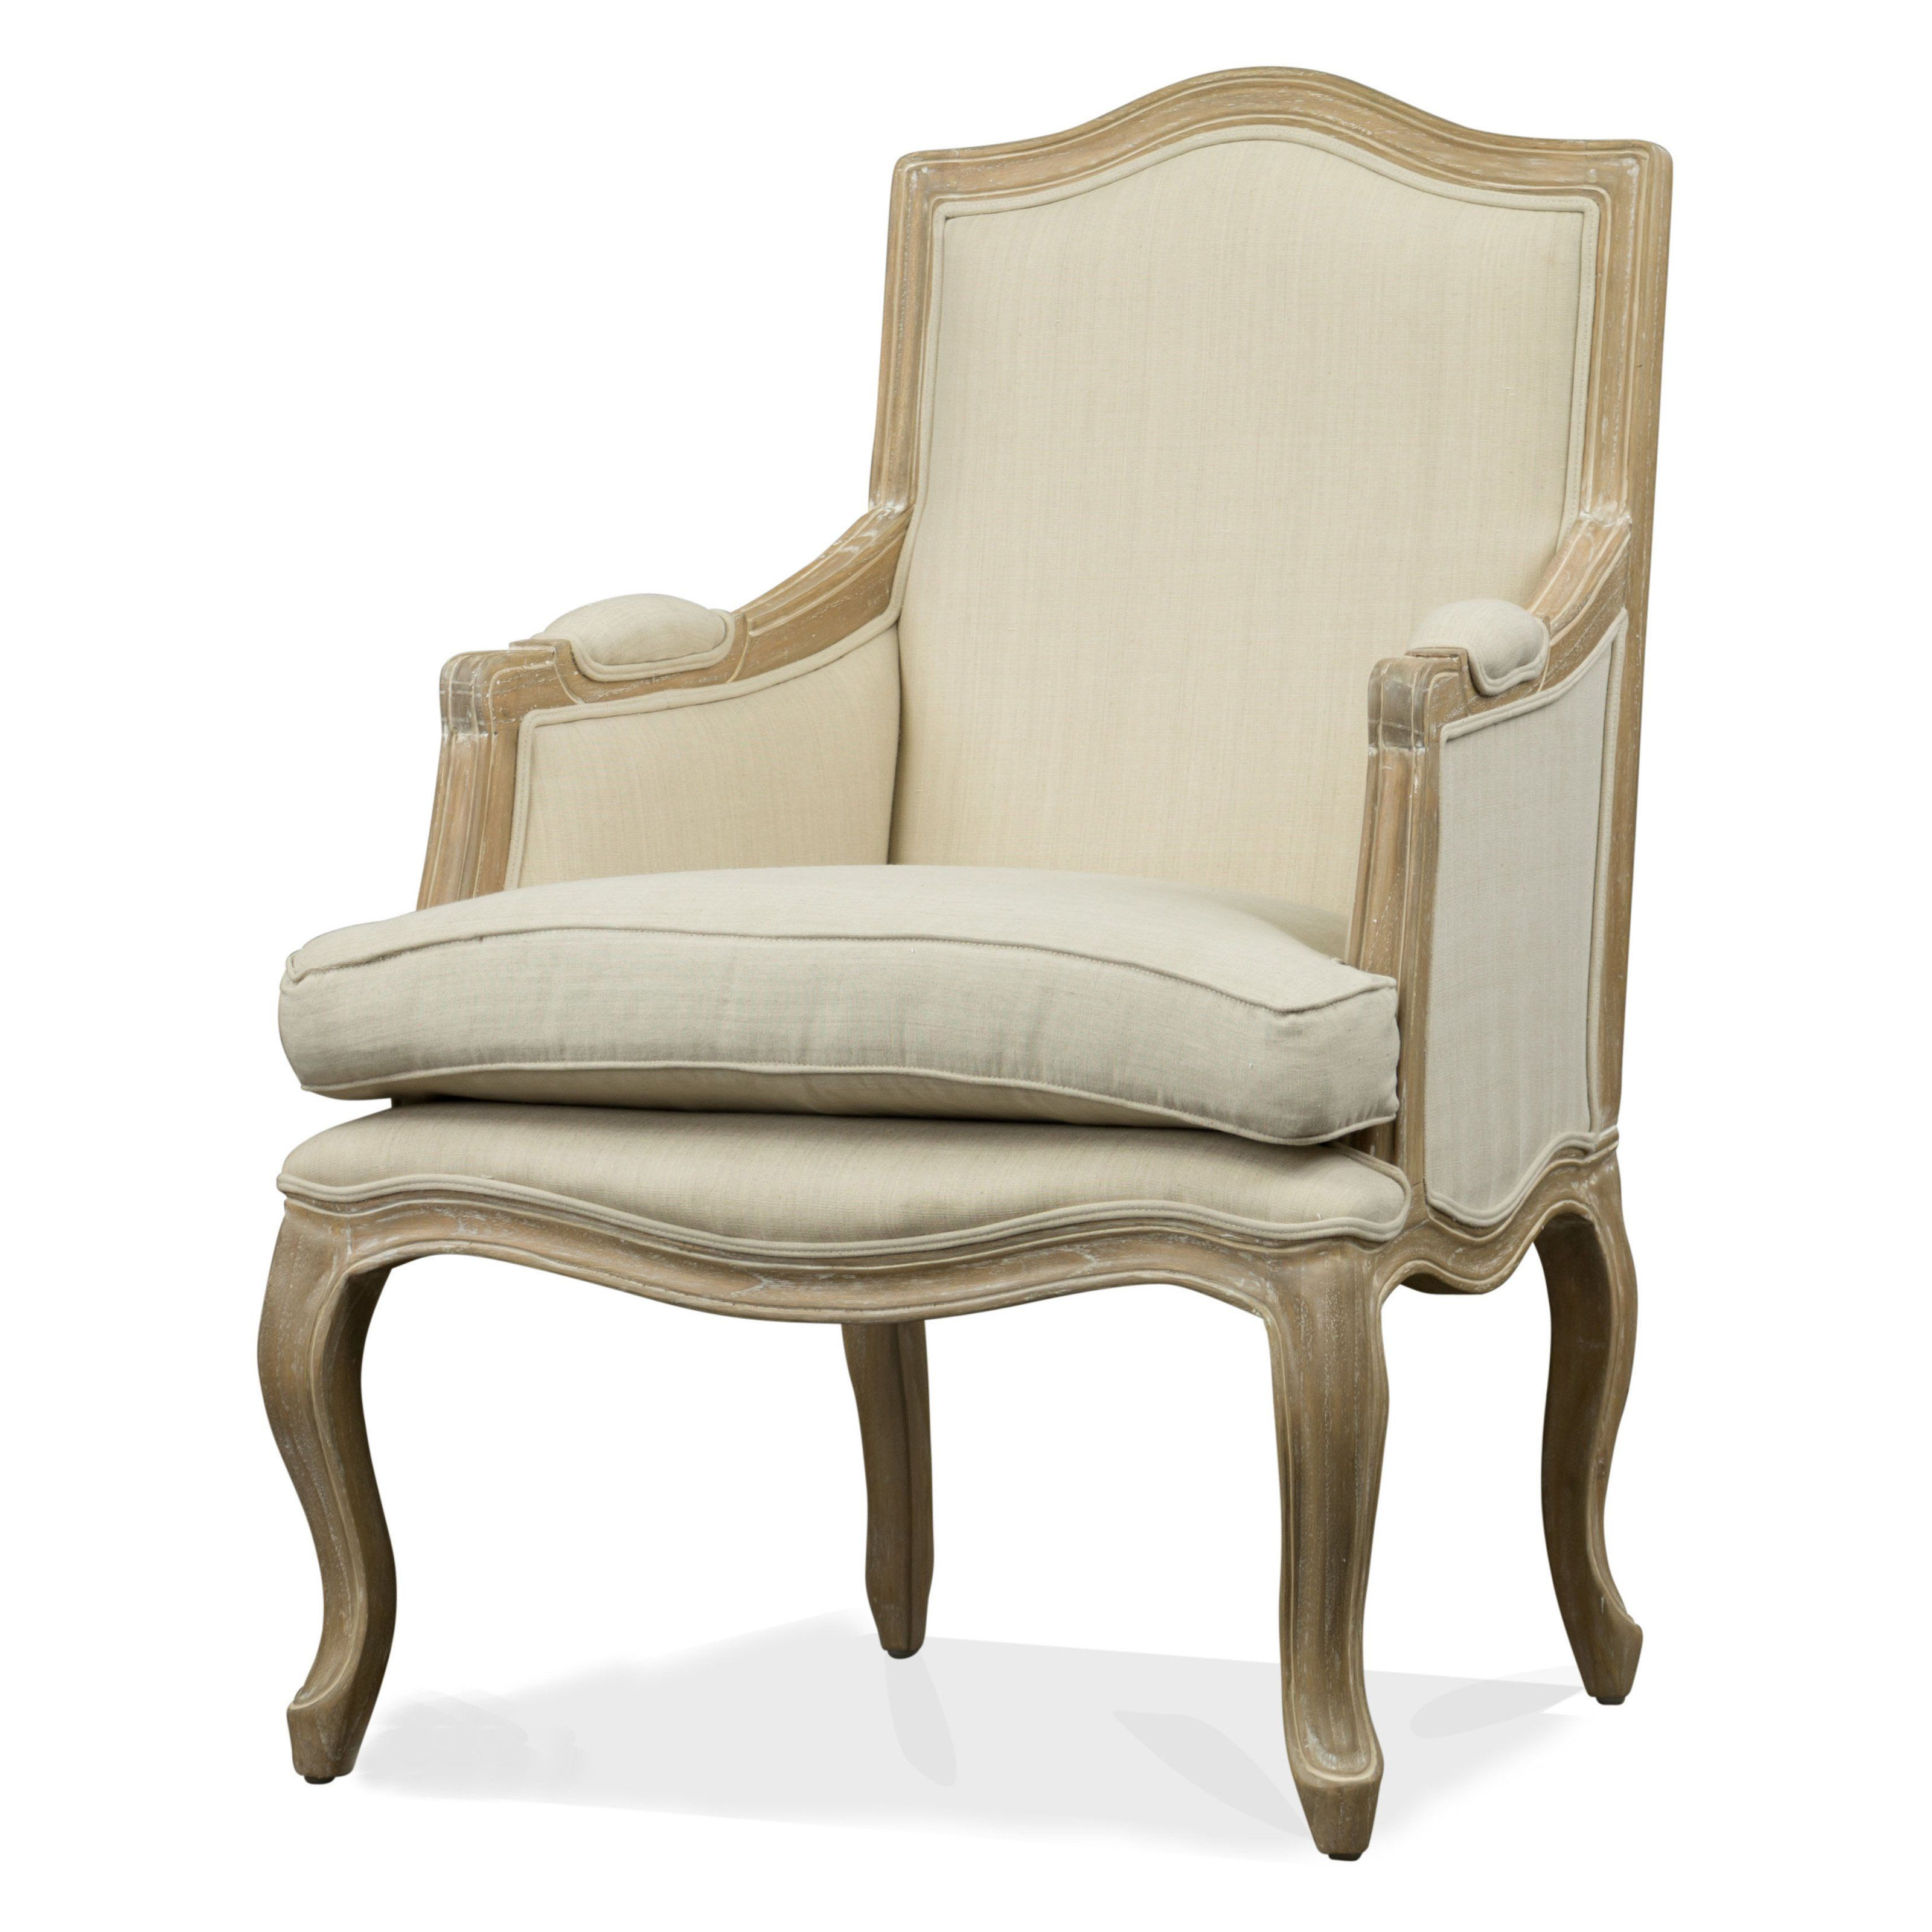 Baxton Studio Nivernais French Accent Chair - ASS288MI CG4 ...